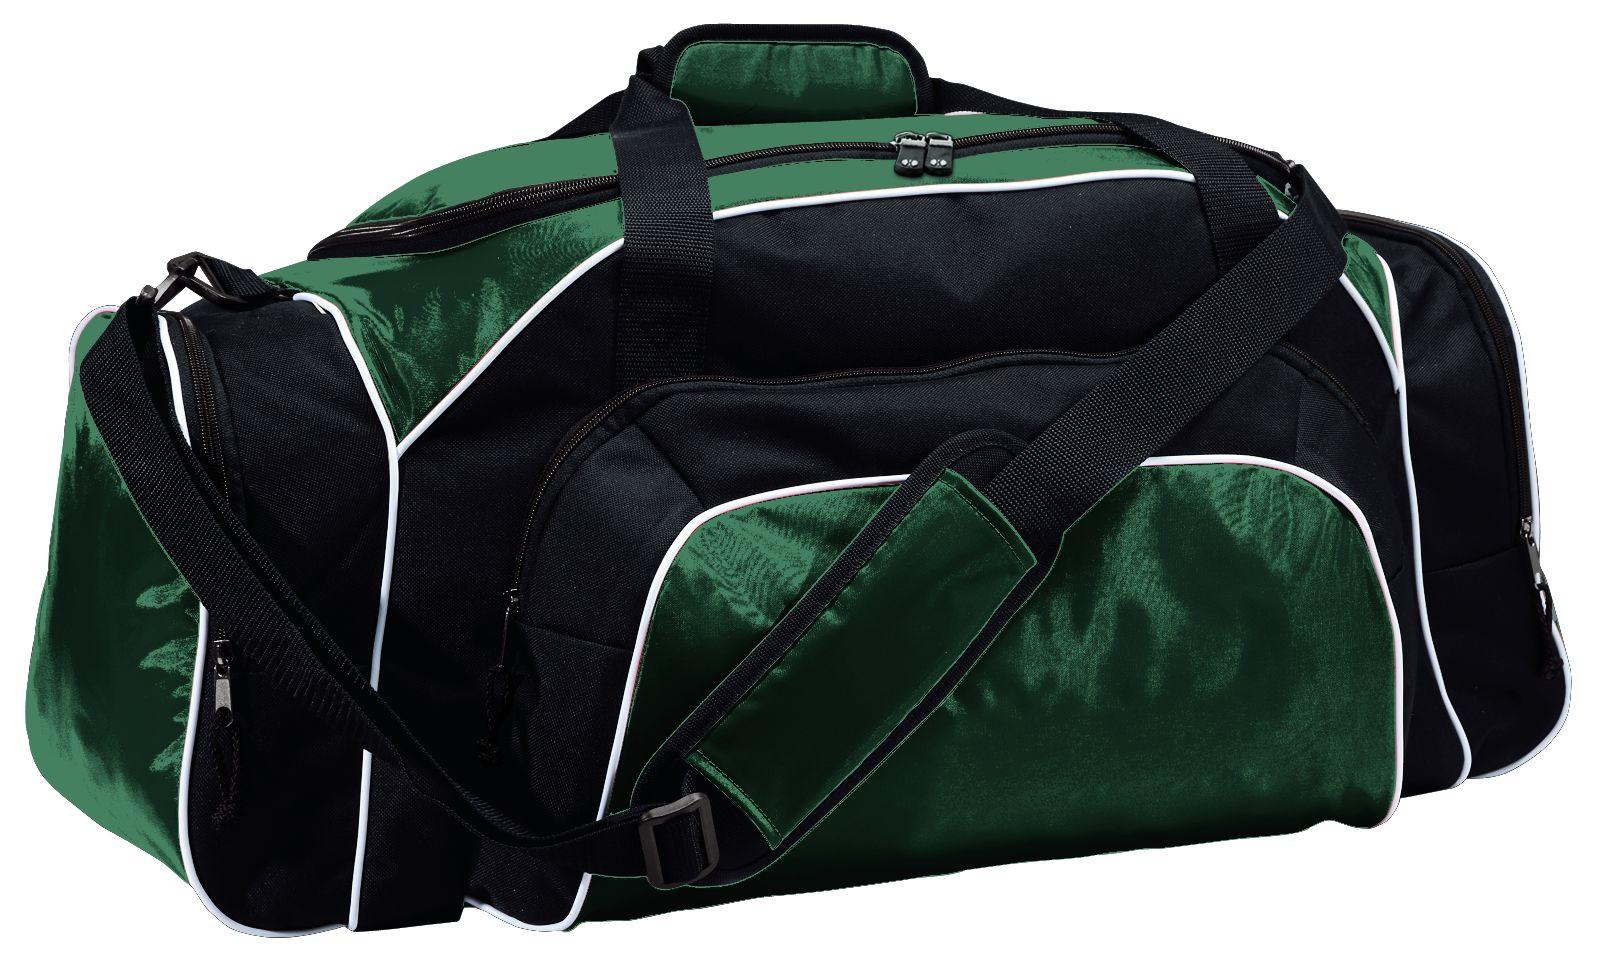 Tournament Duffel Bag - DARK GREEN/BLACK/WHITE